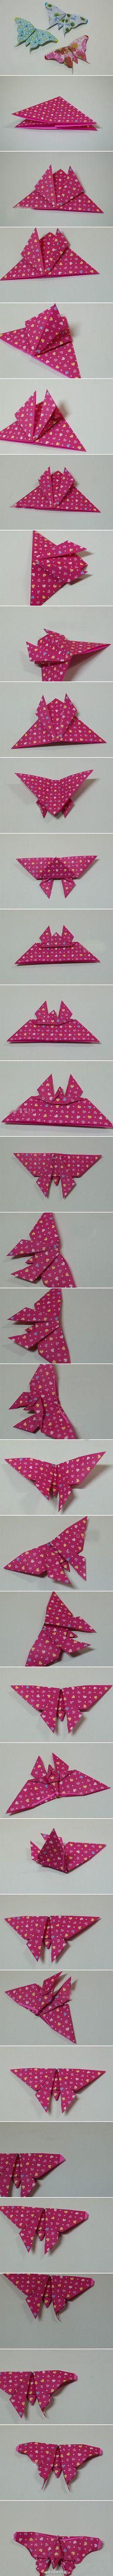 Paper Butterfly tutorial #diy #crafts www.BlueRainbowDesign.com